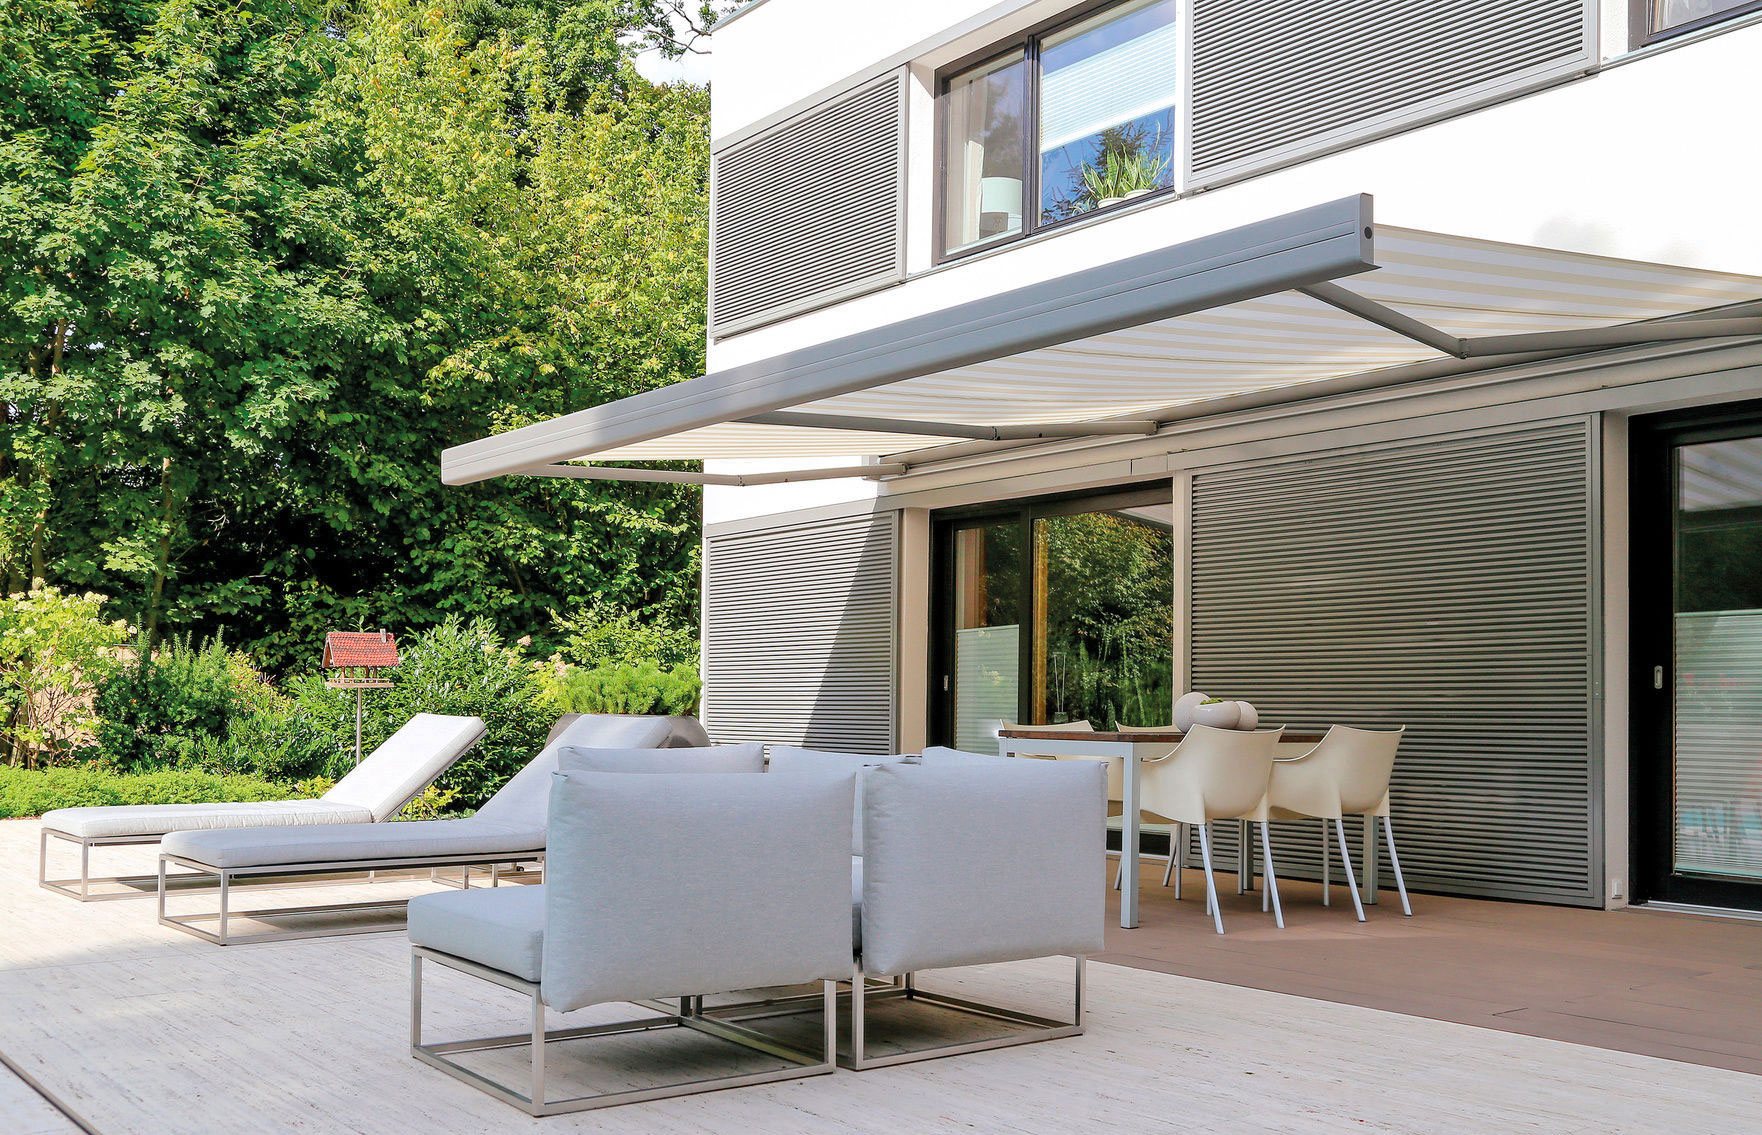 sonnenschutz f r drau en thoms sonnenschutztechnik gmbh. Black Bedroom Furniture Sets. Home Design Ideas